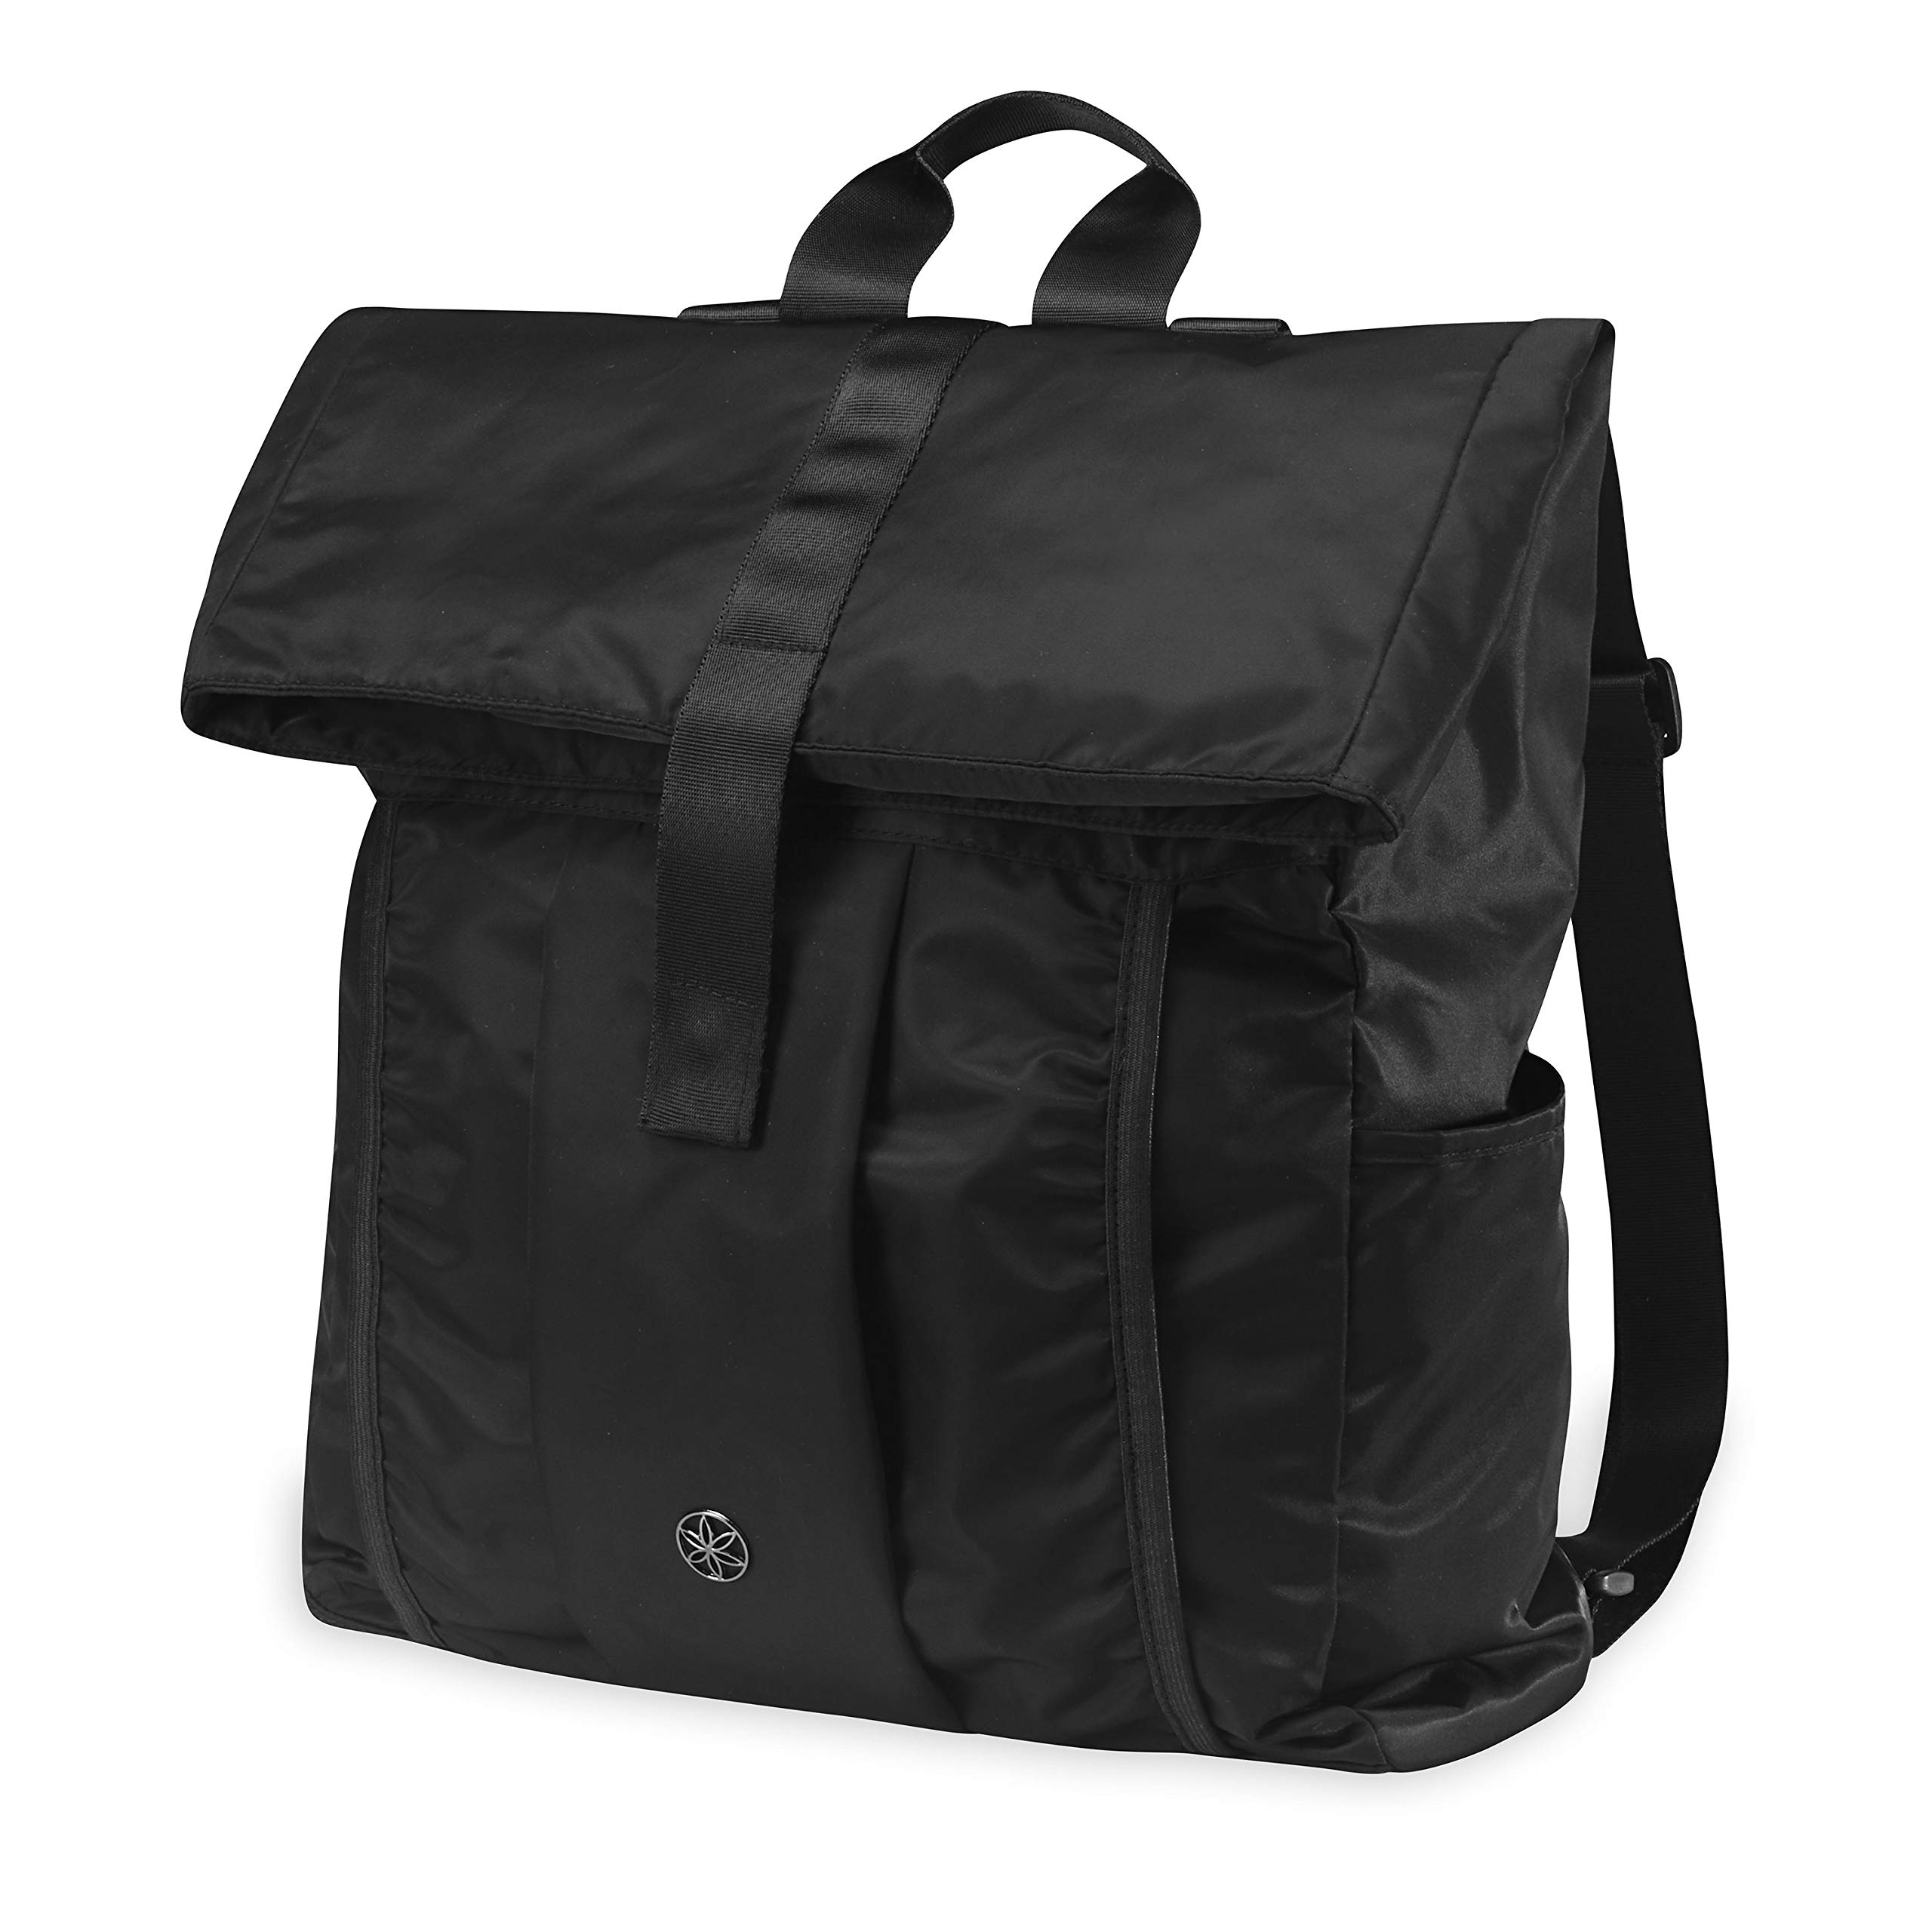 Gaiam Holds Everything Yoga Mat Bag